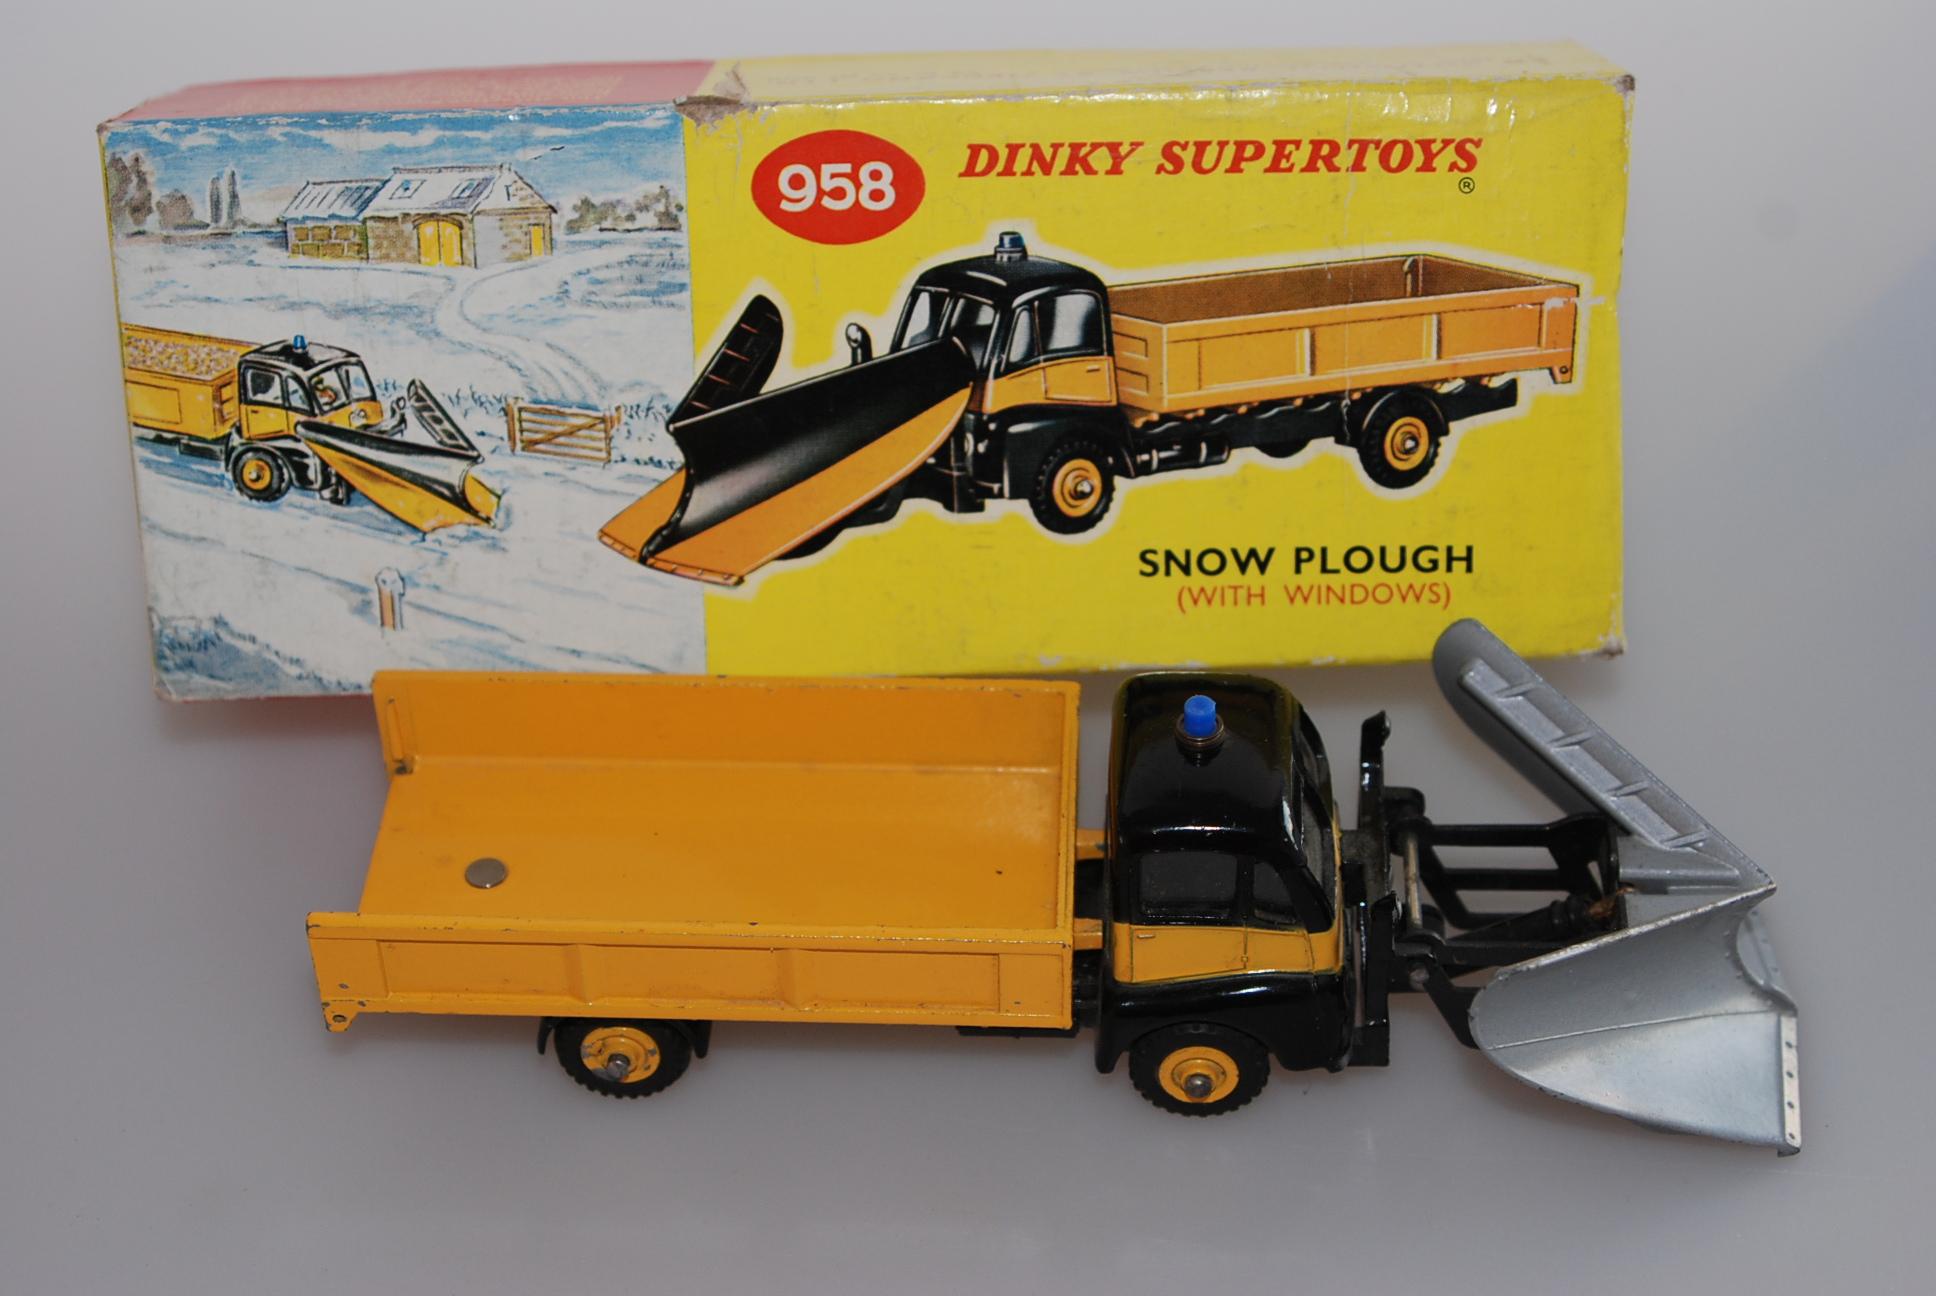 Dinky Supertoys 958 Snow Plough